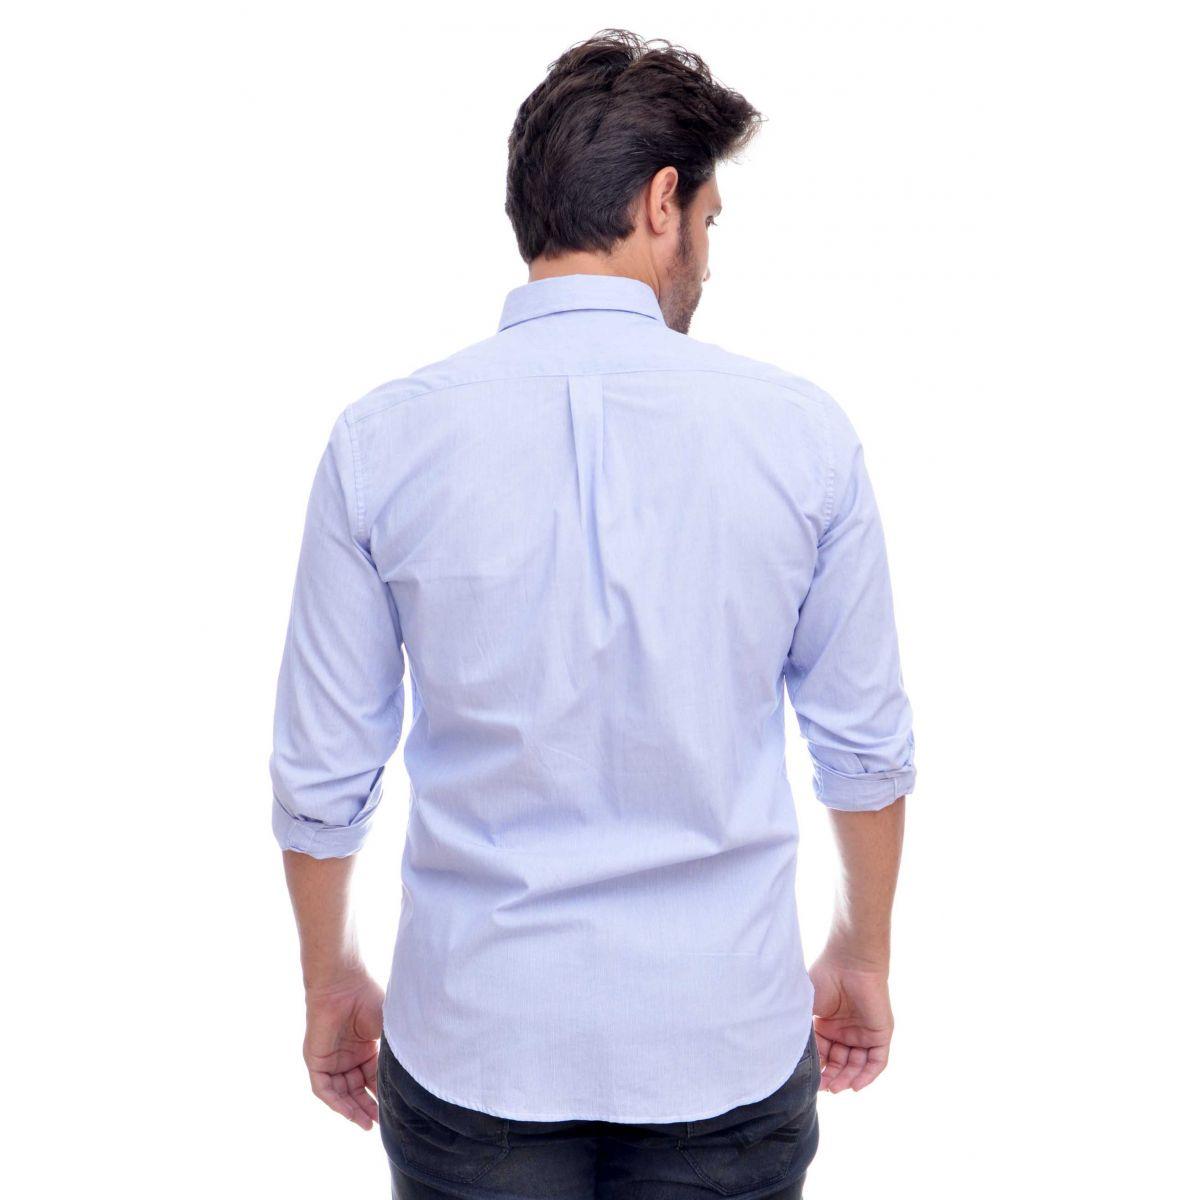 Camisa Social RL  Listras Azul/Branco Colored   - Ca Brasileira